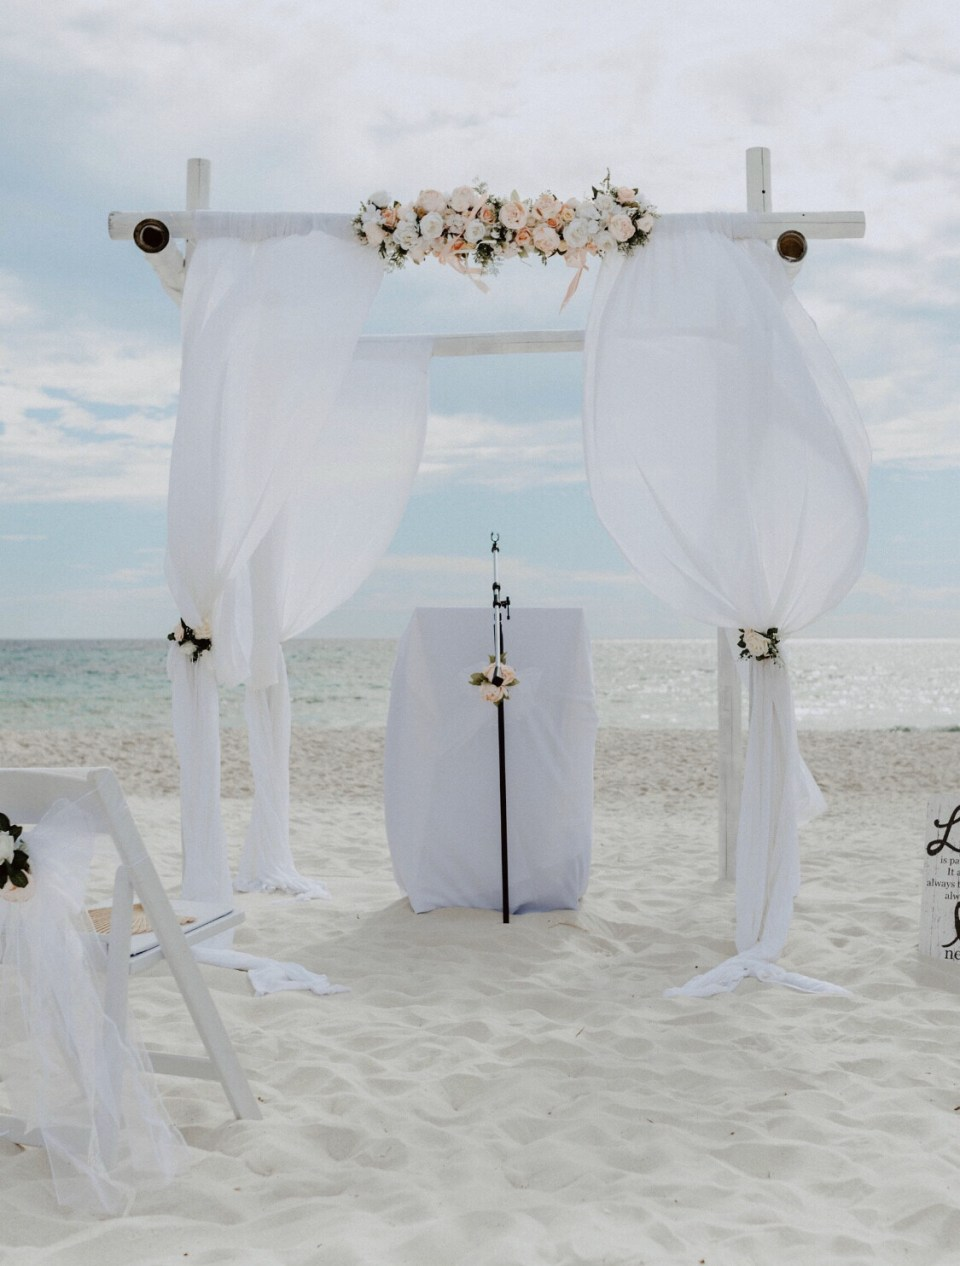 4 Post Bamboo Arch w/ White Chiffon Curtains